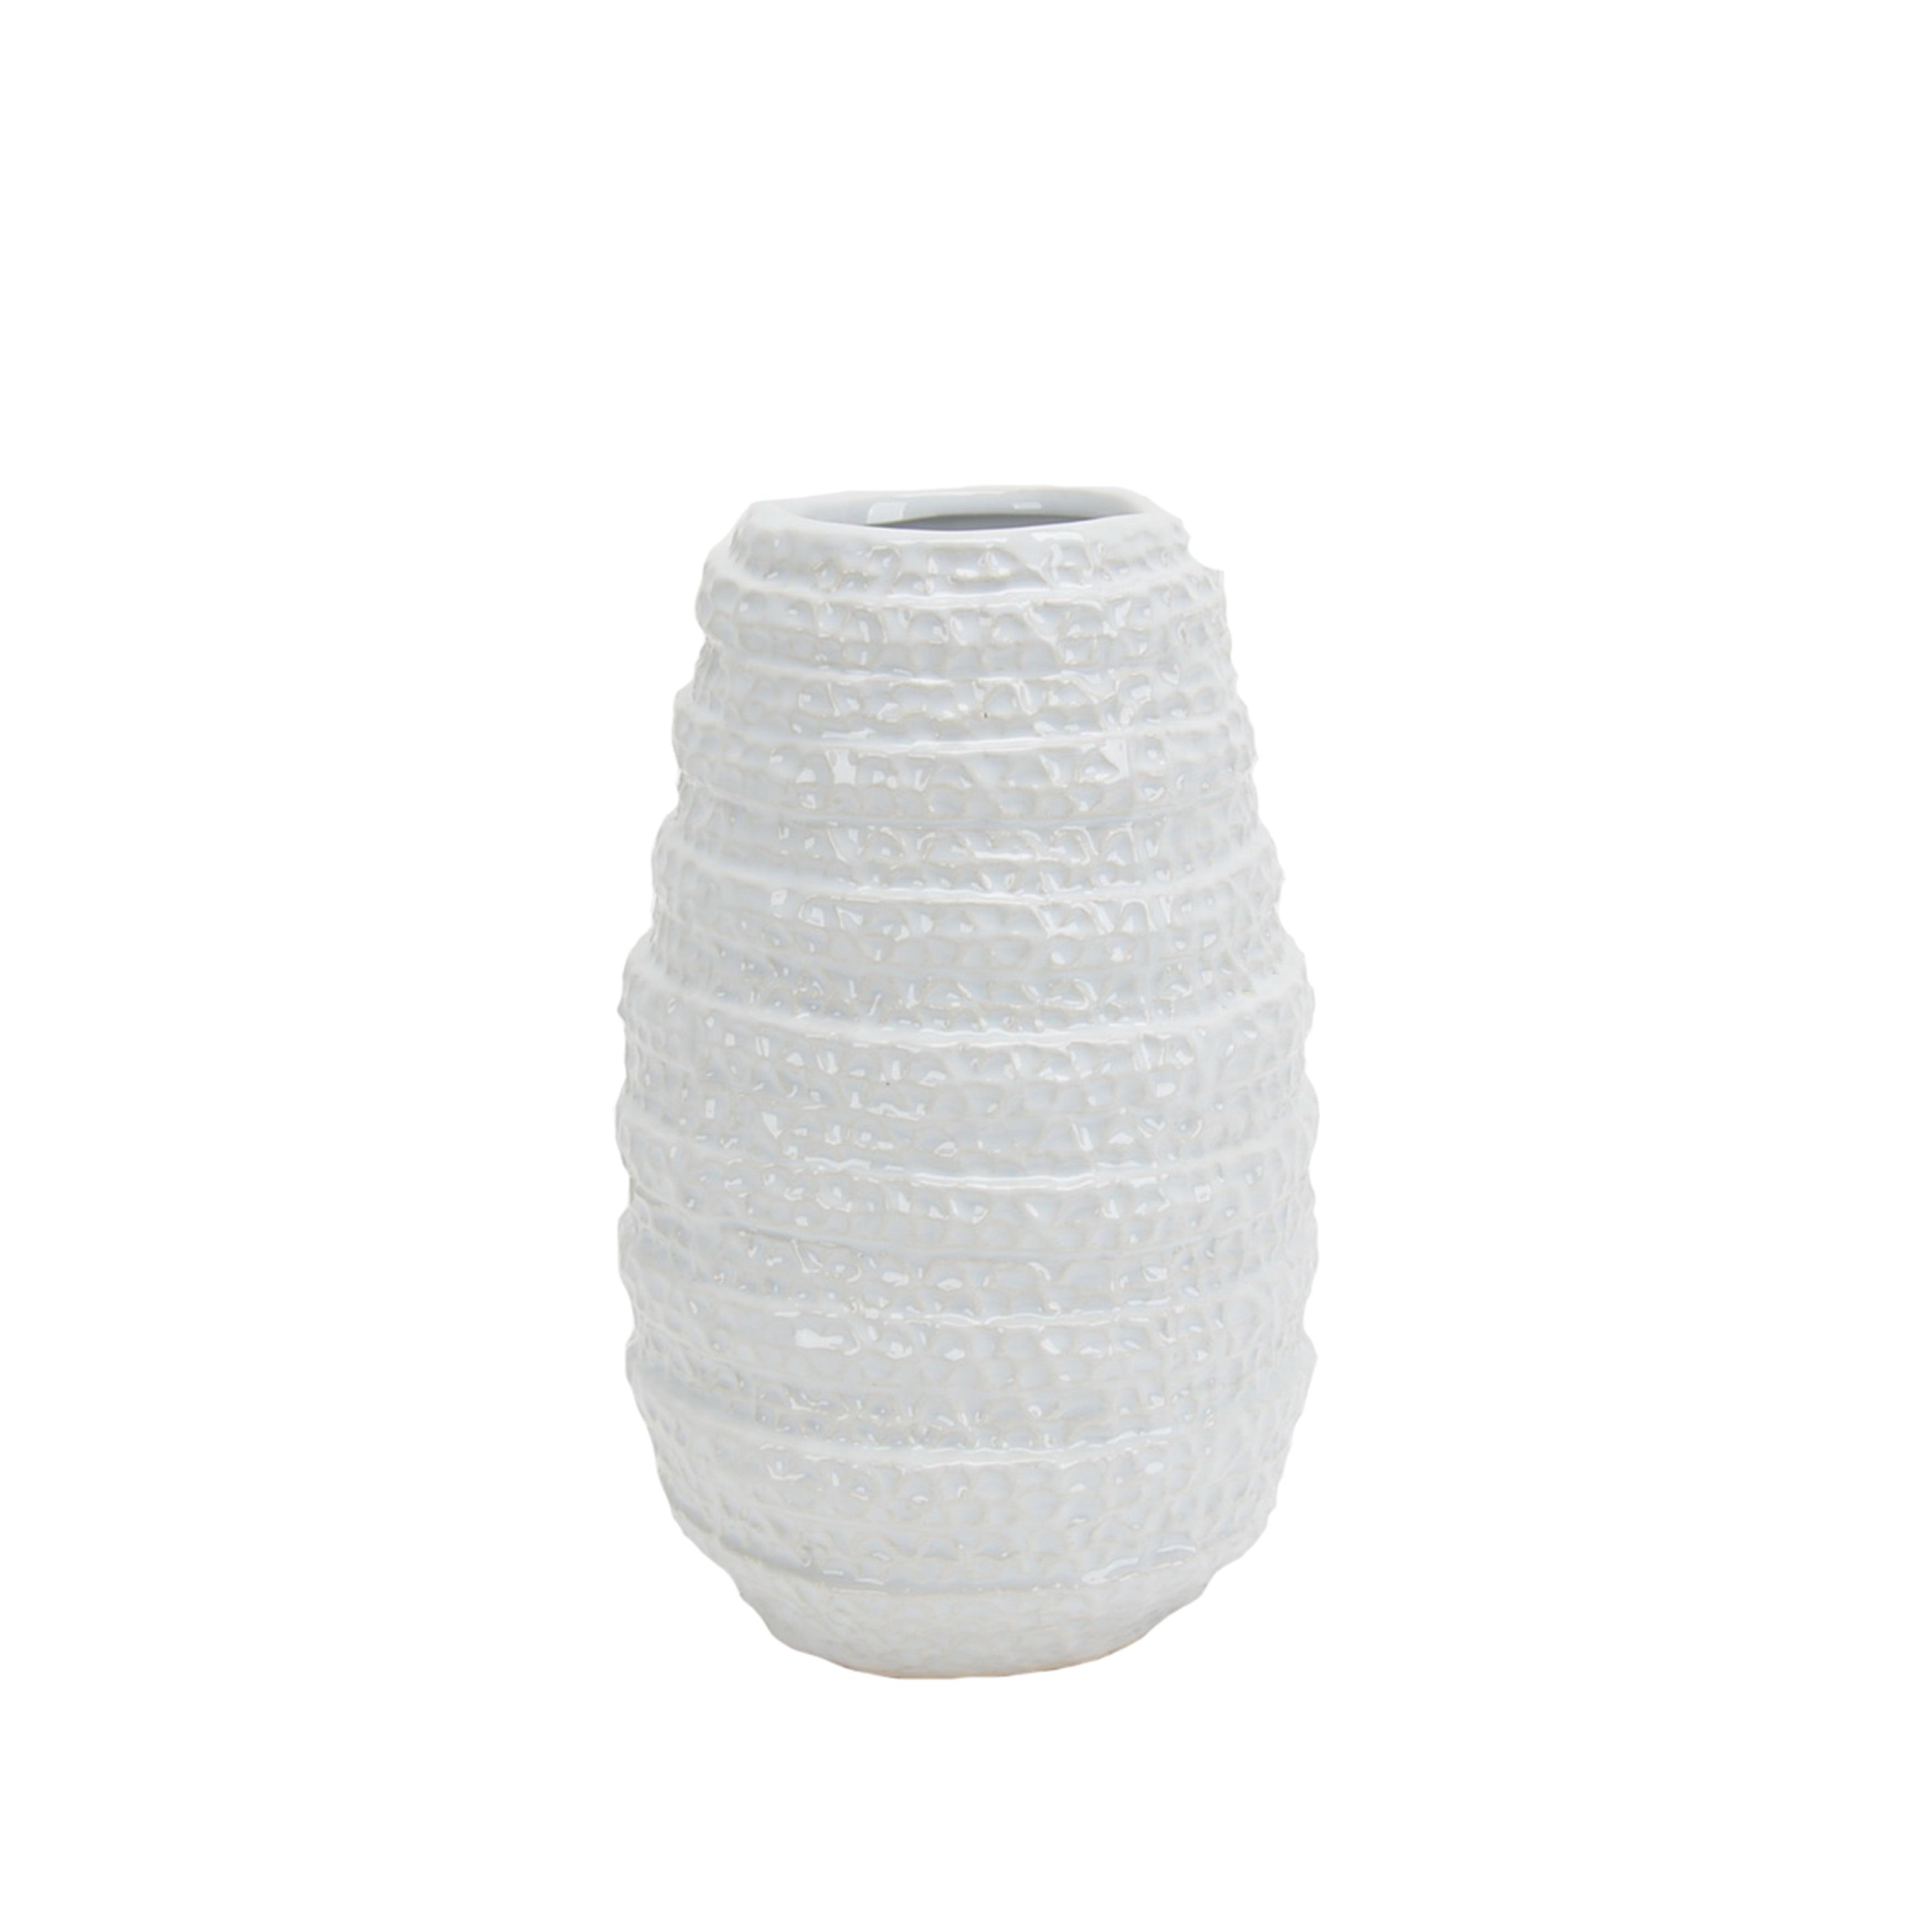 Ceramic Vase with Textured Design, Small, White